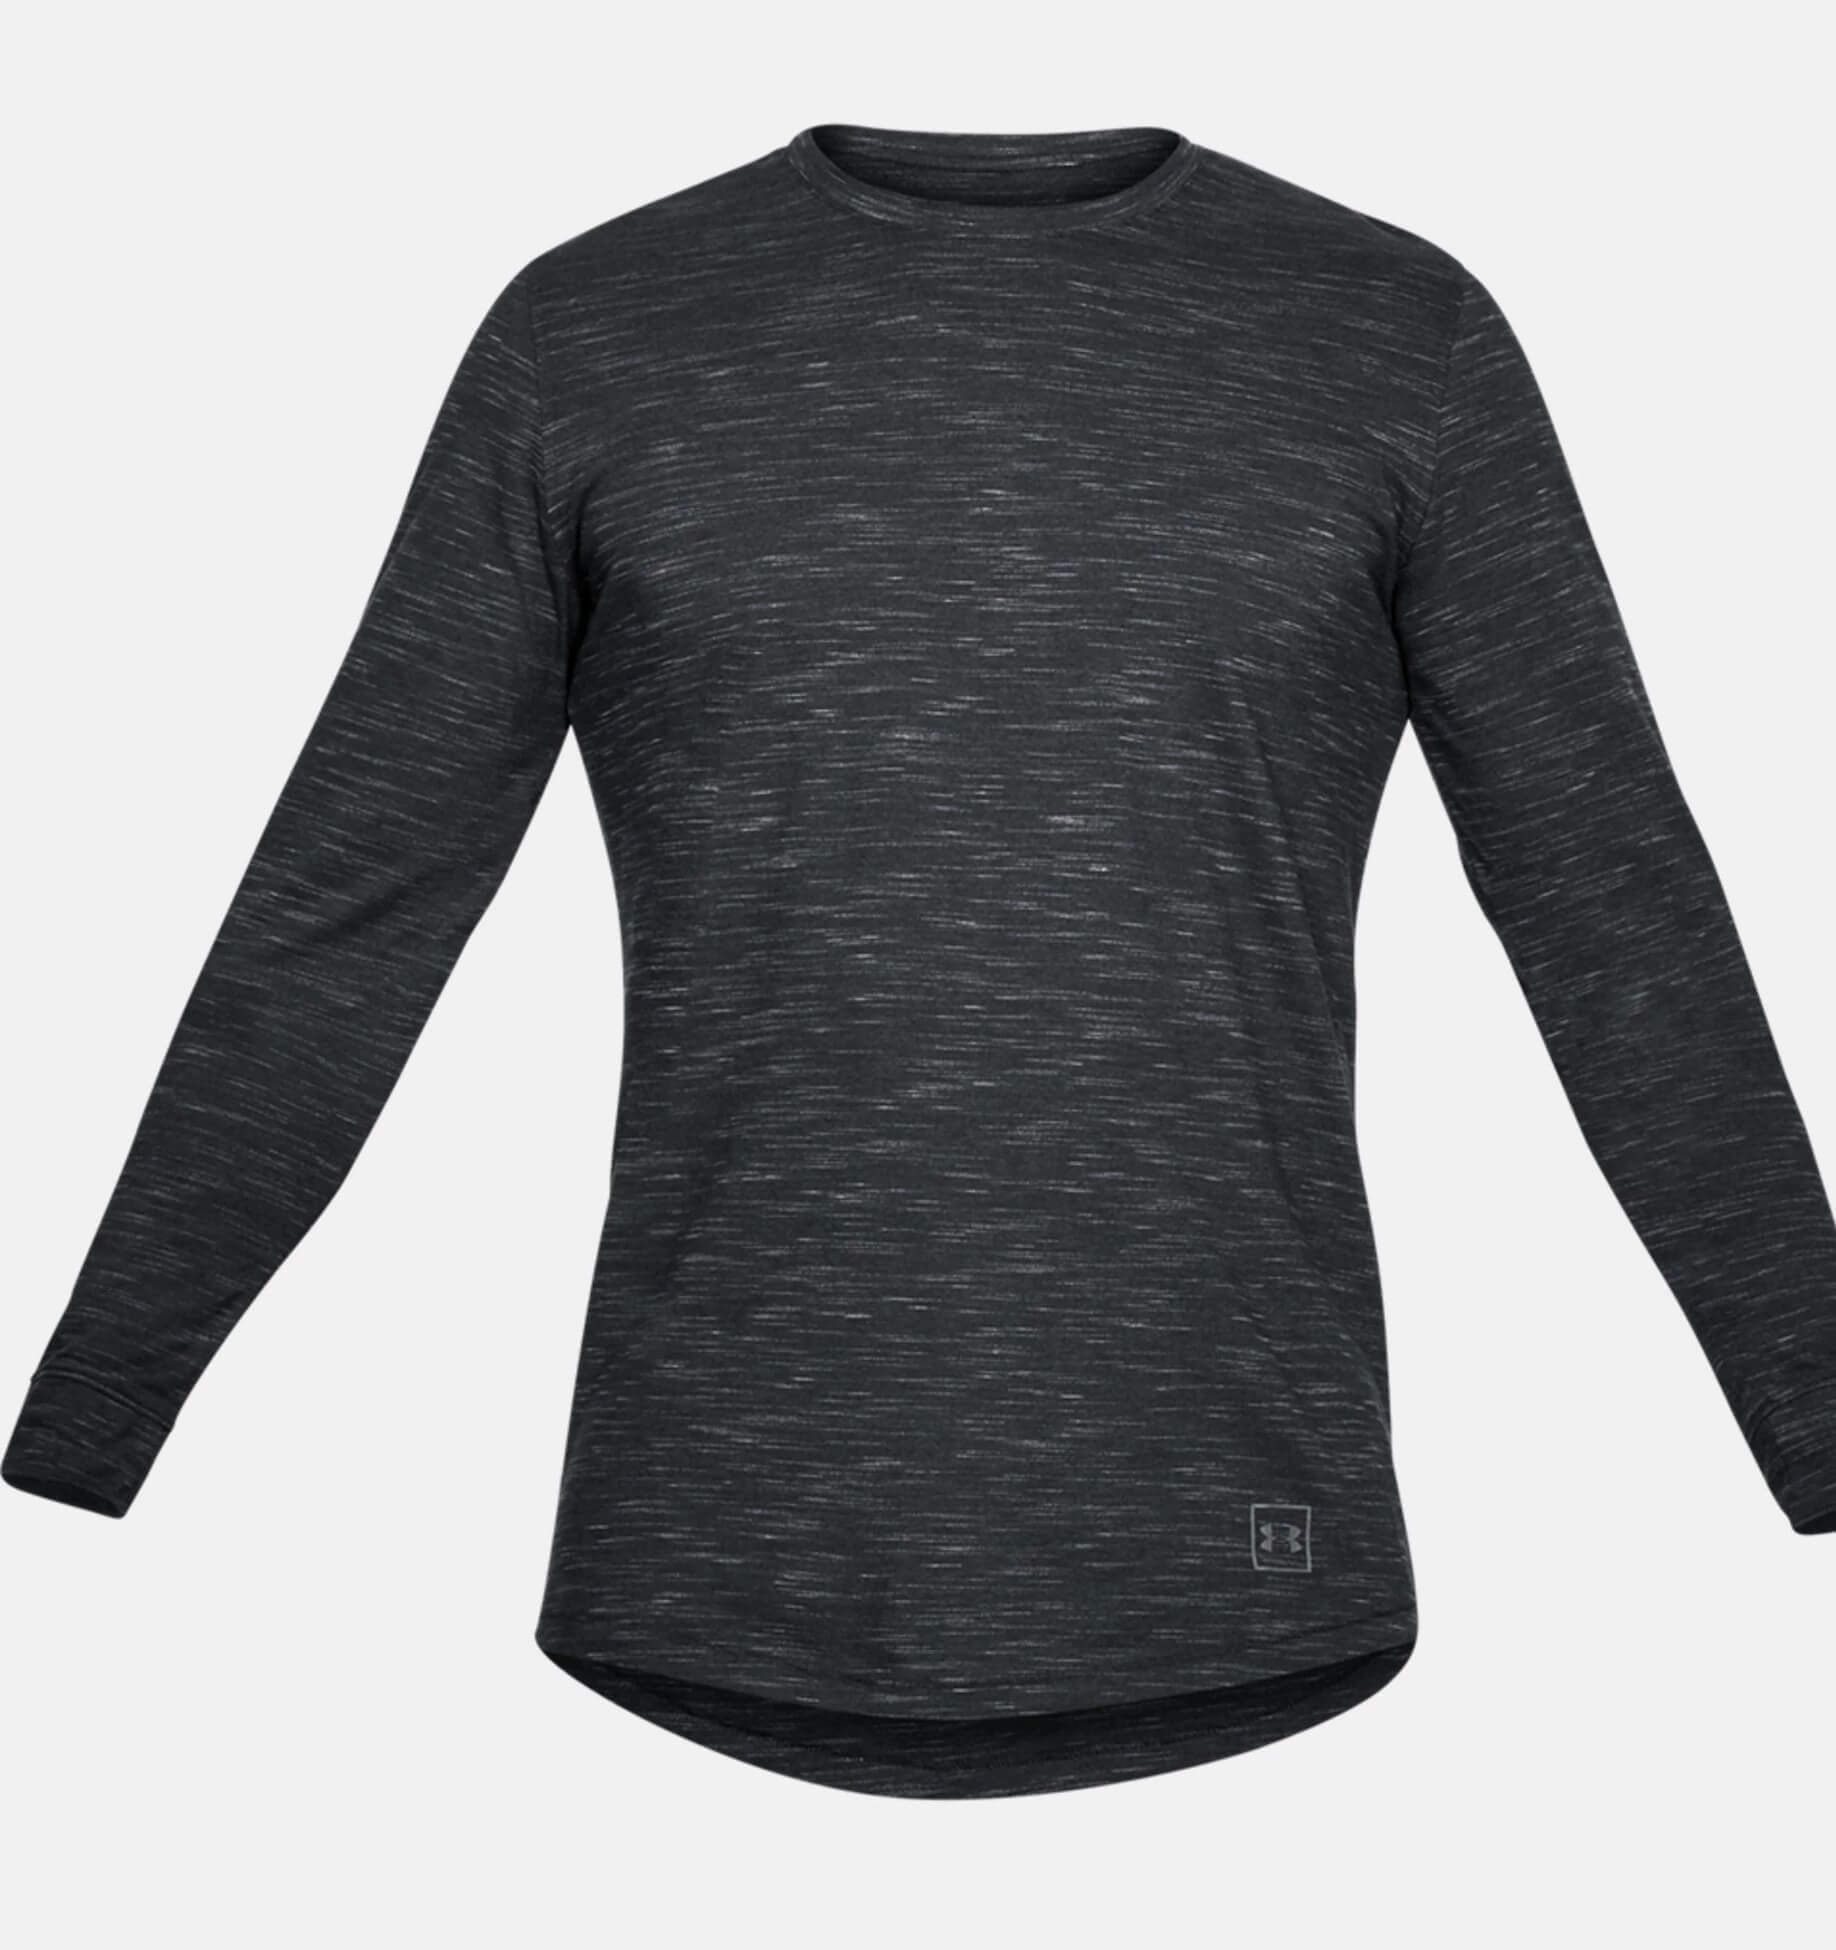 Camiseta Masculina Under Armour Sportstyle Tee - BRACIA SHOP  Loja ... 34d64963e10cb